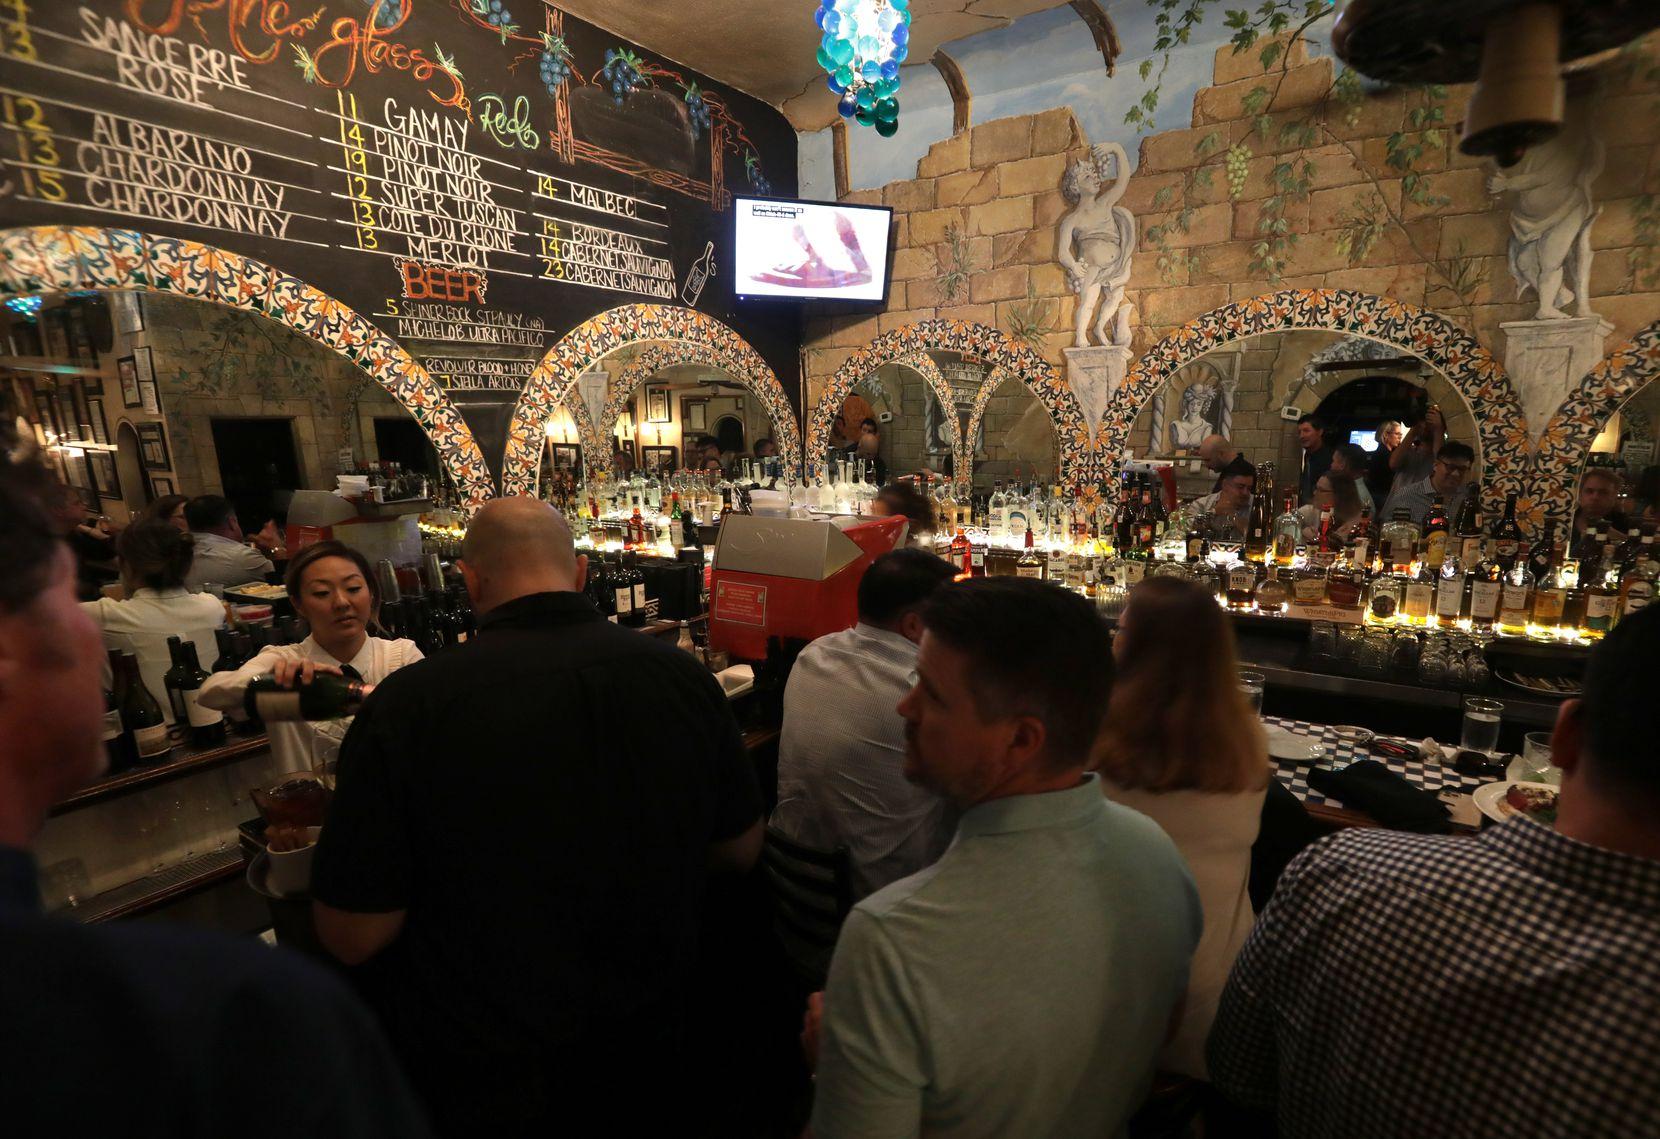 The bar, with Gillian Bradshaw-Smith's Italian landscape murals